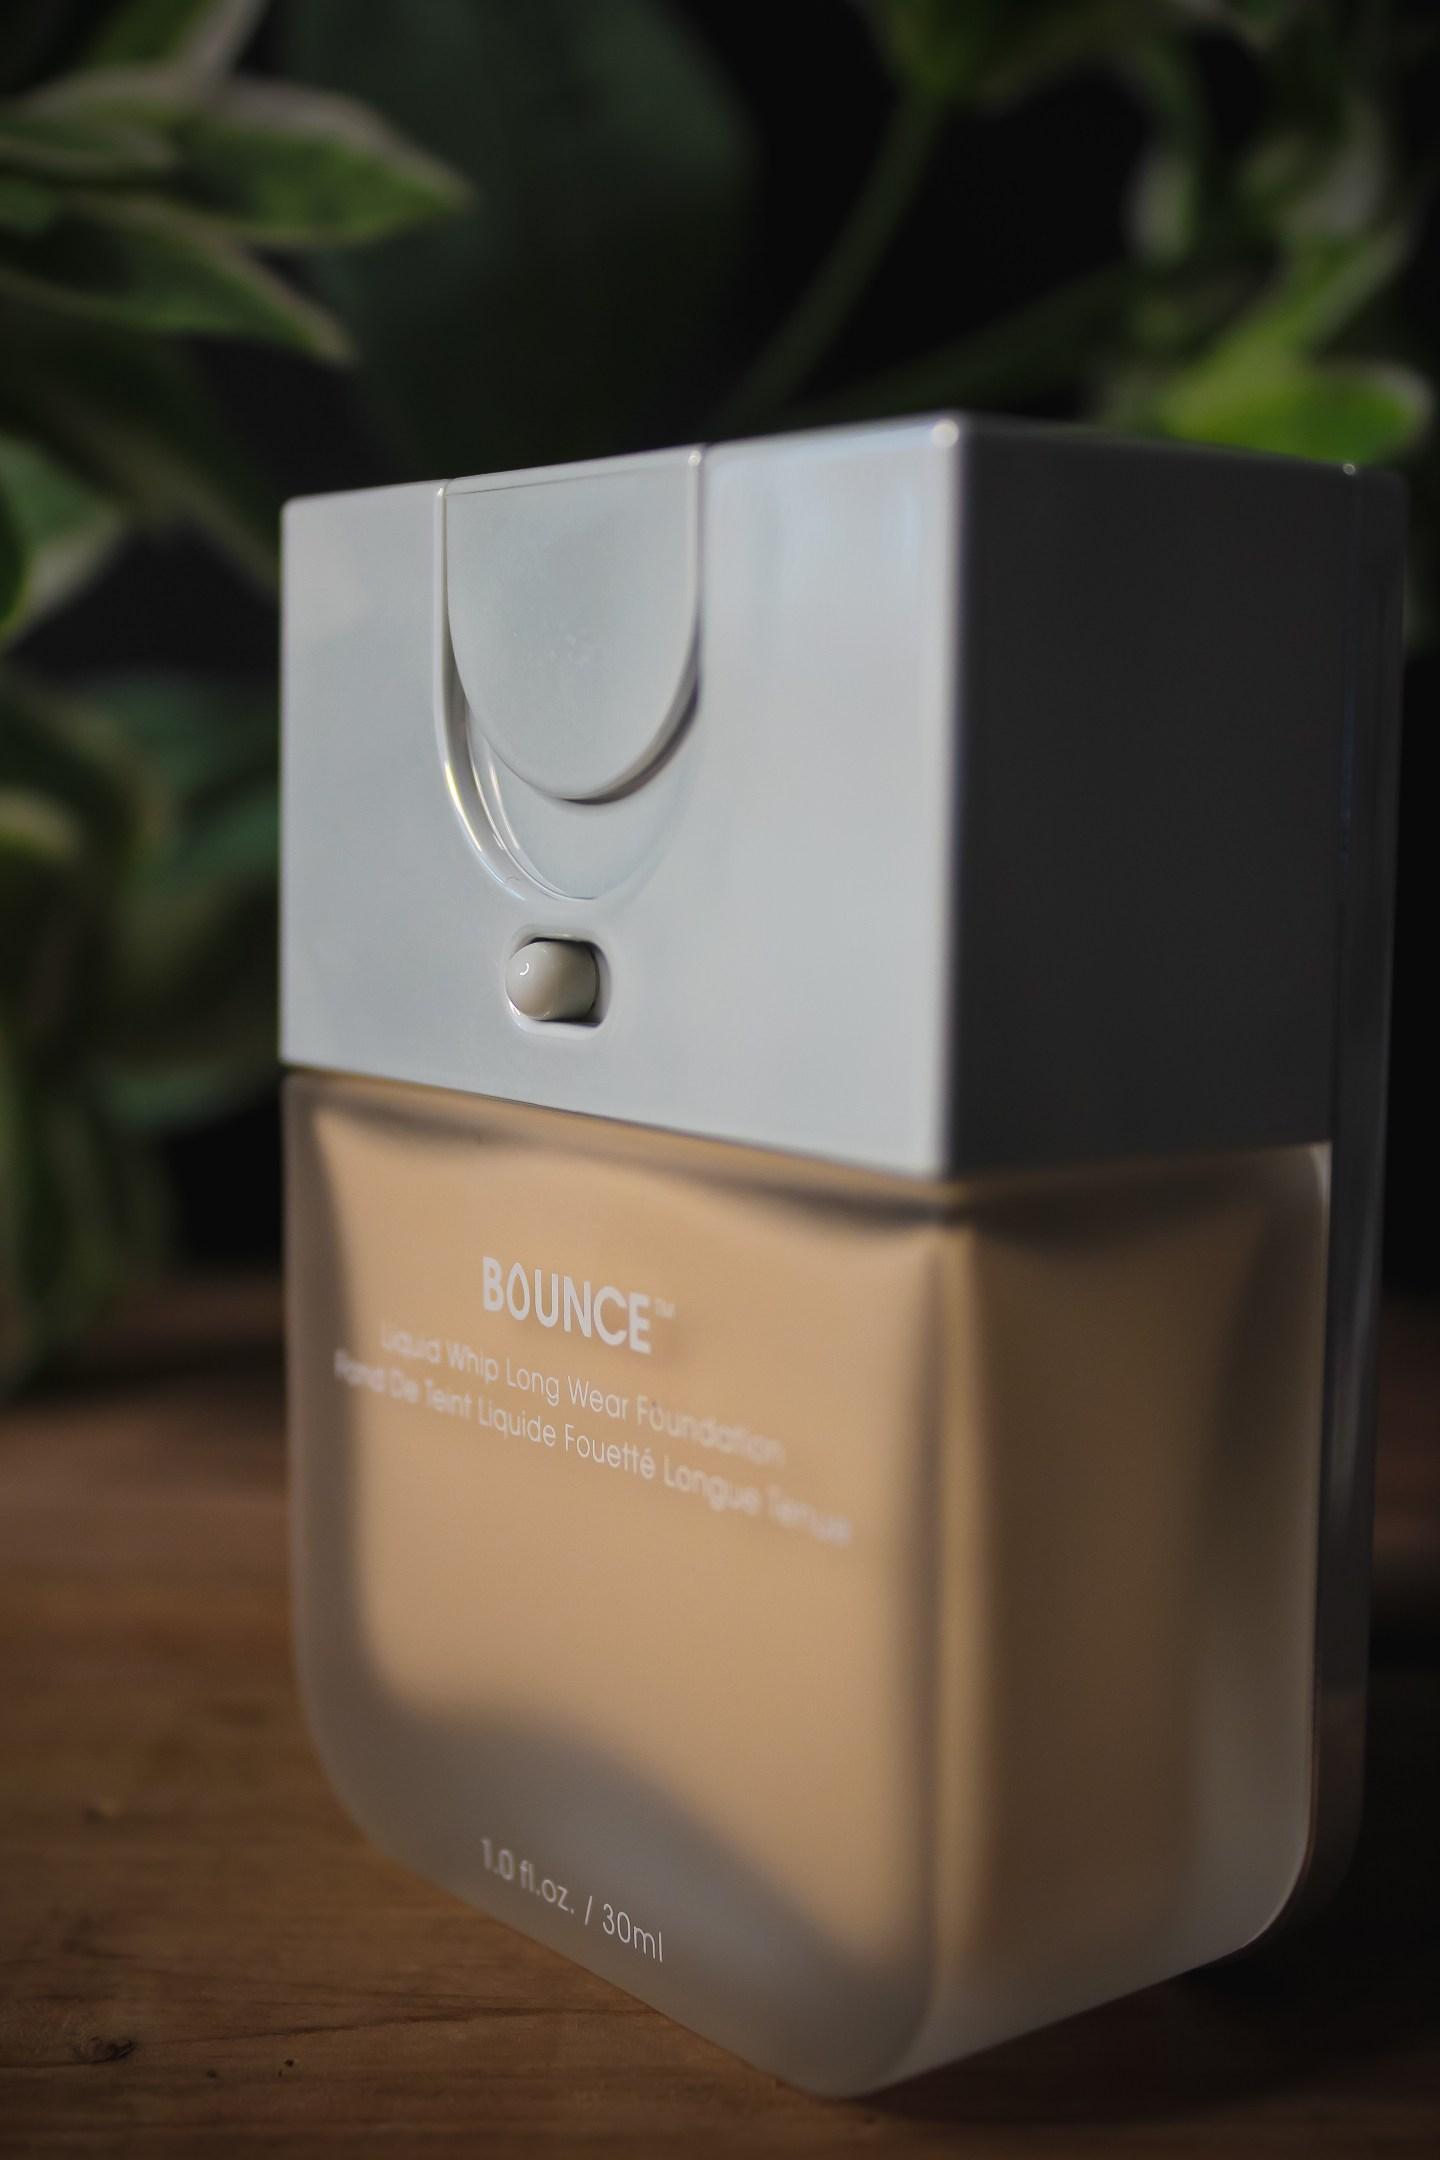 BeautyBlender Bounce Liquid Whip Long Wear Foundation Review & Wear Test 1